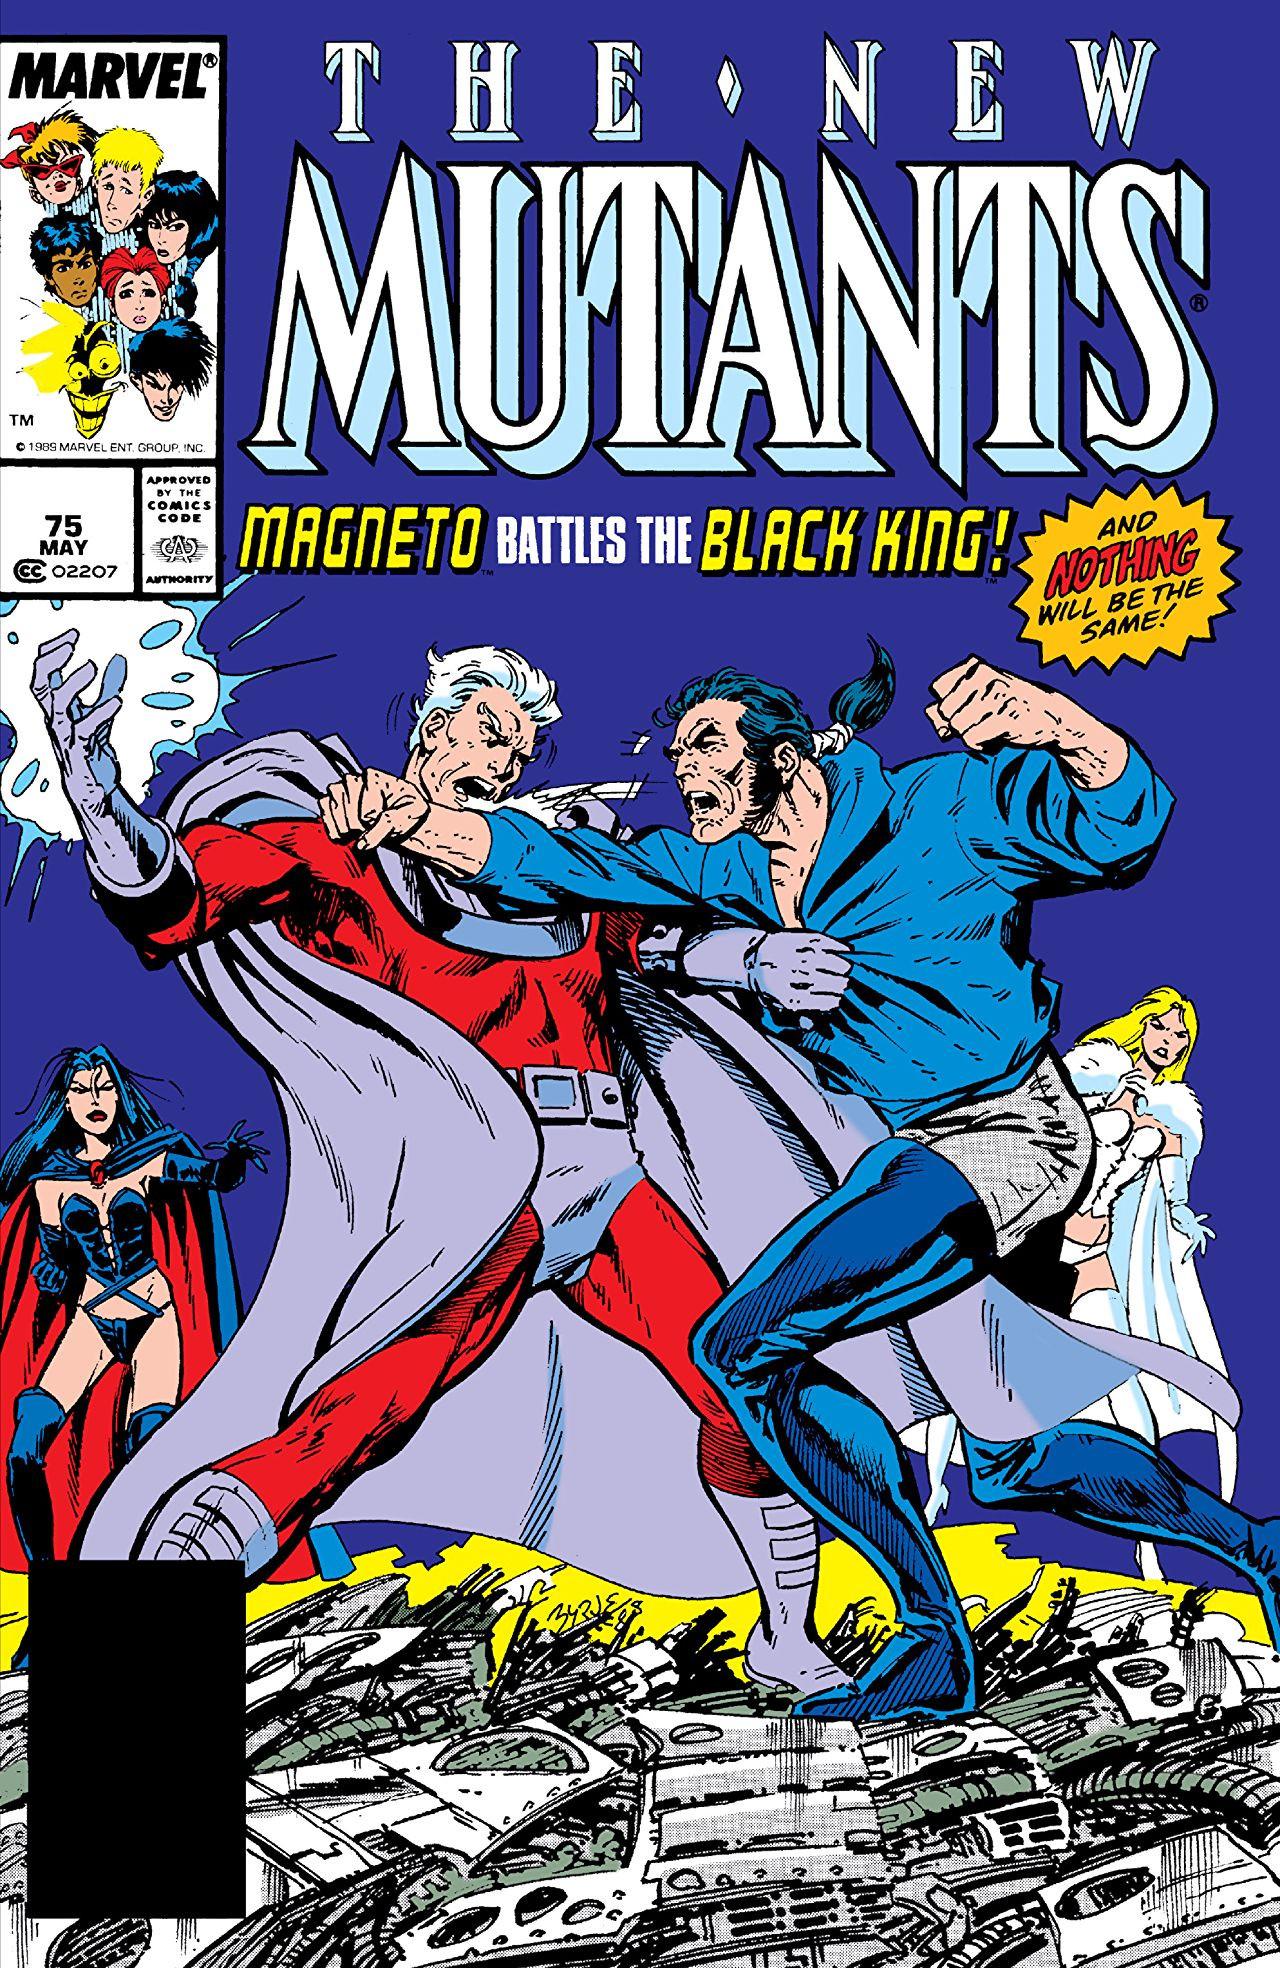 New Mutants Vol 1 75.jpg